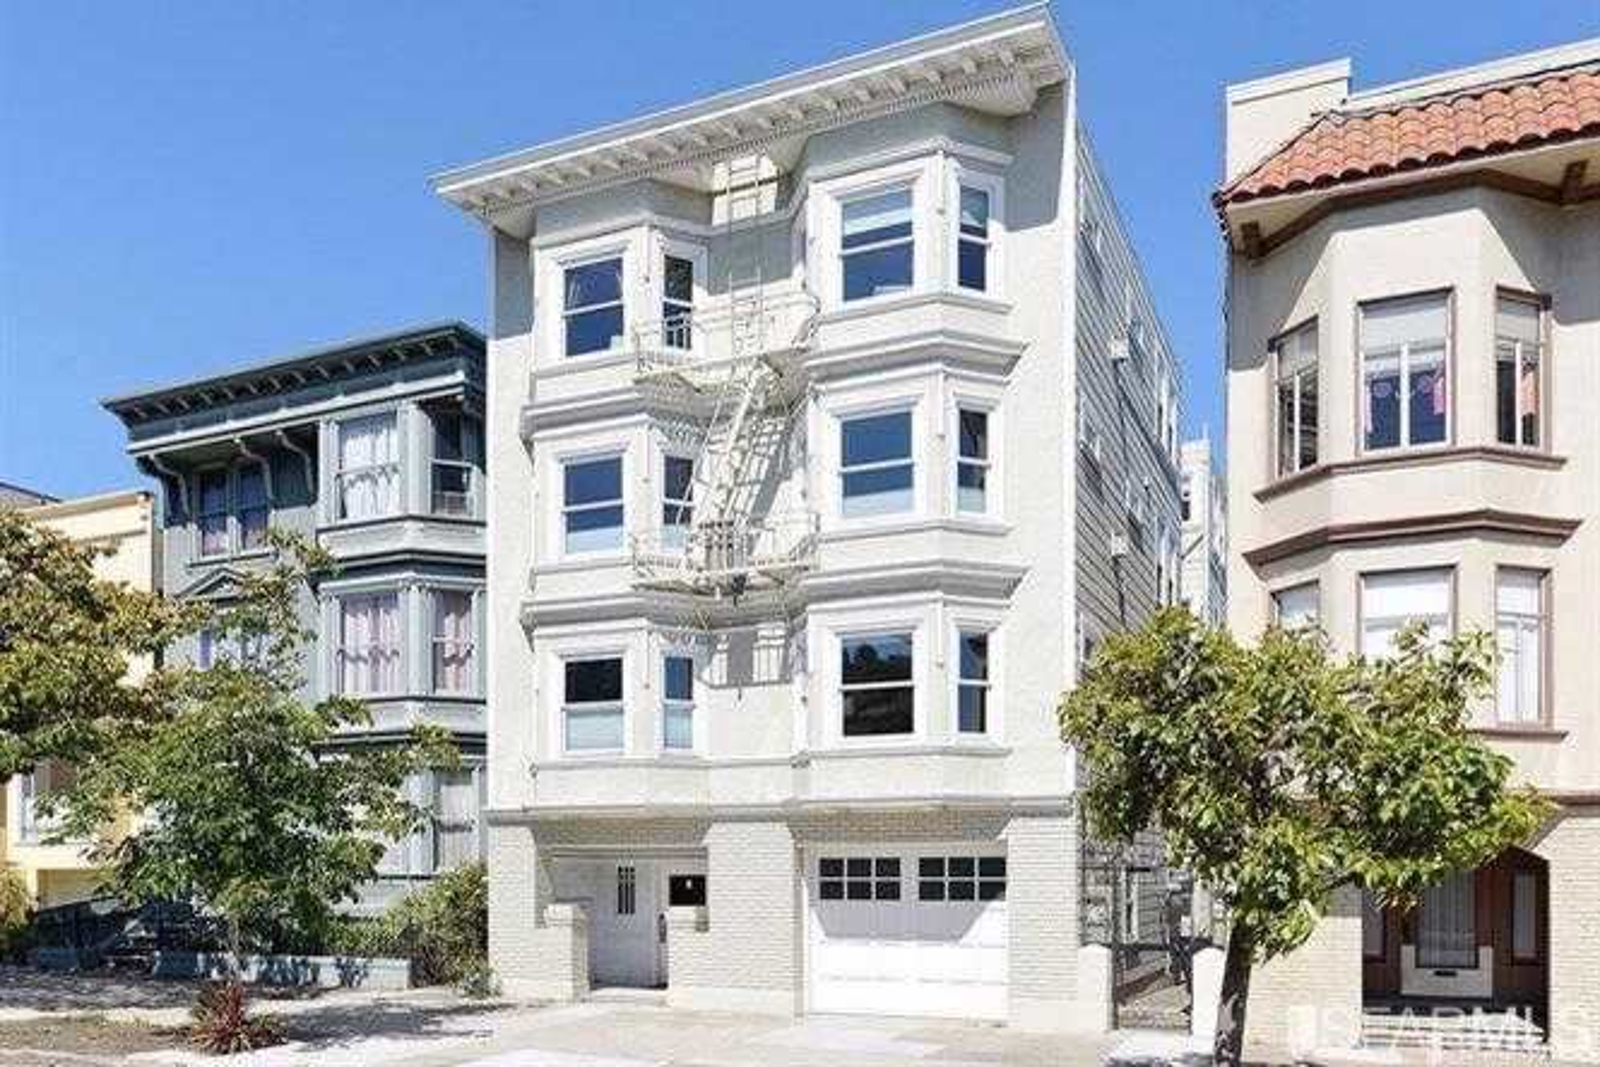 937 Dolores St Apt 6 San Francisco, CA 94110